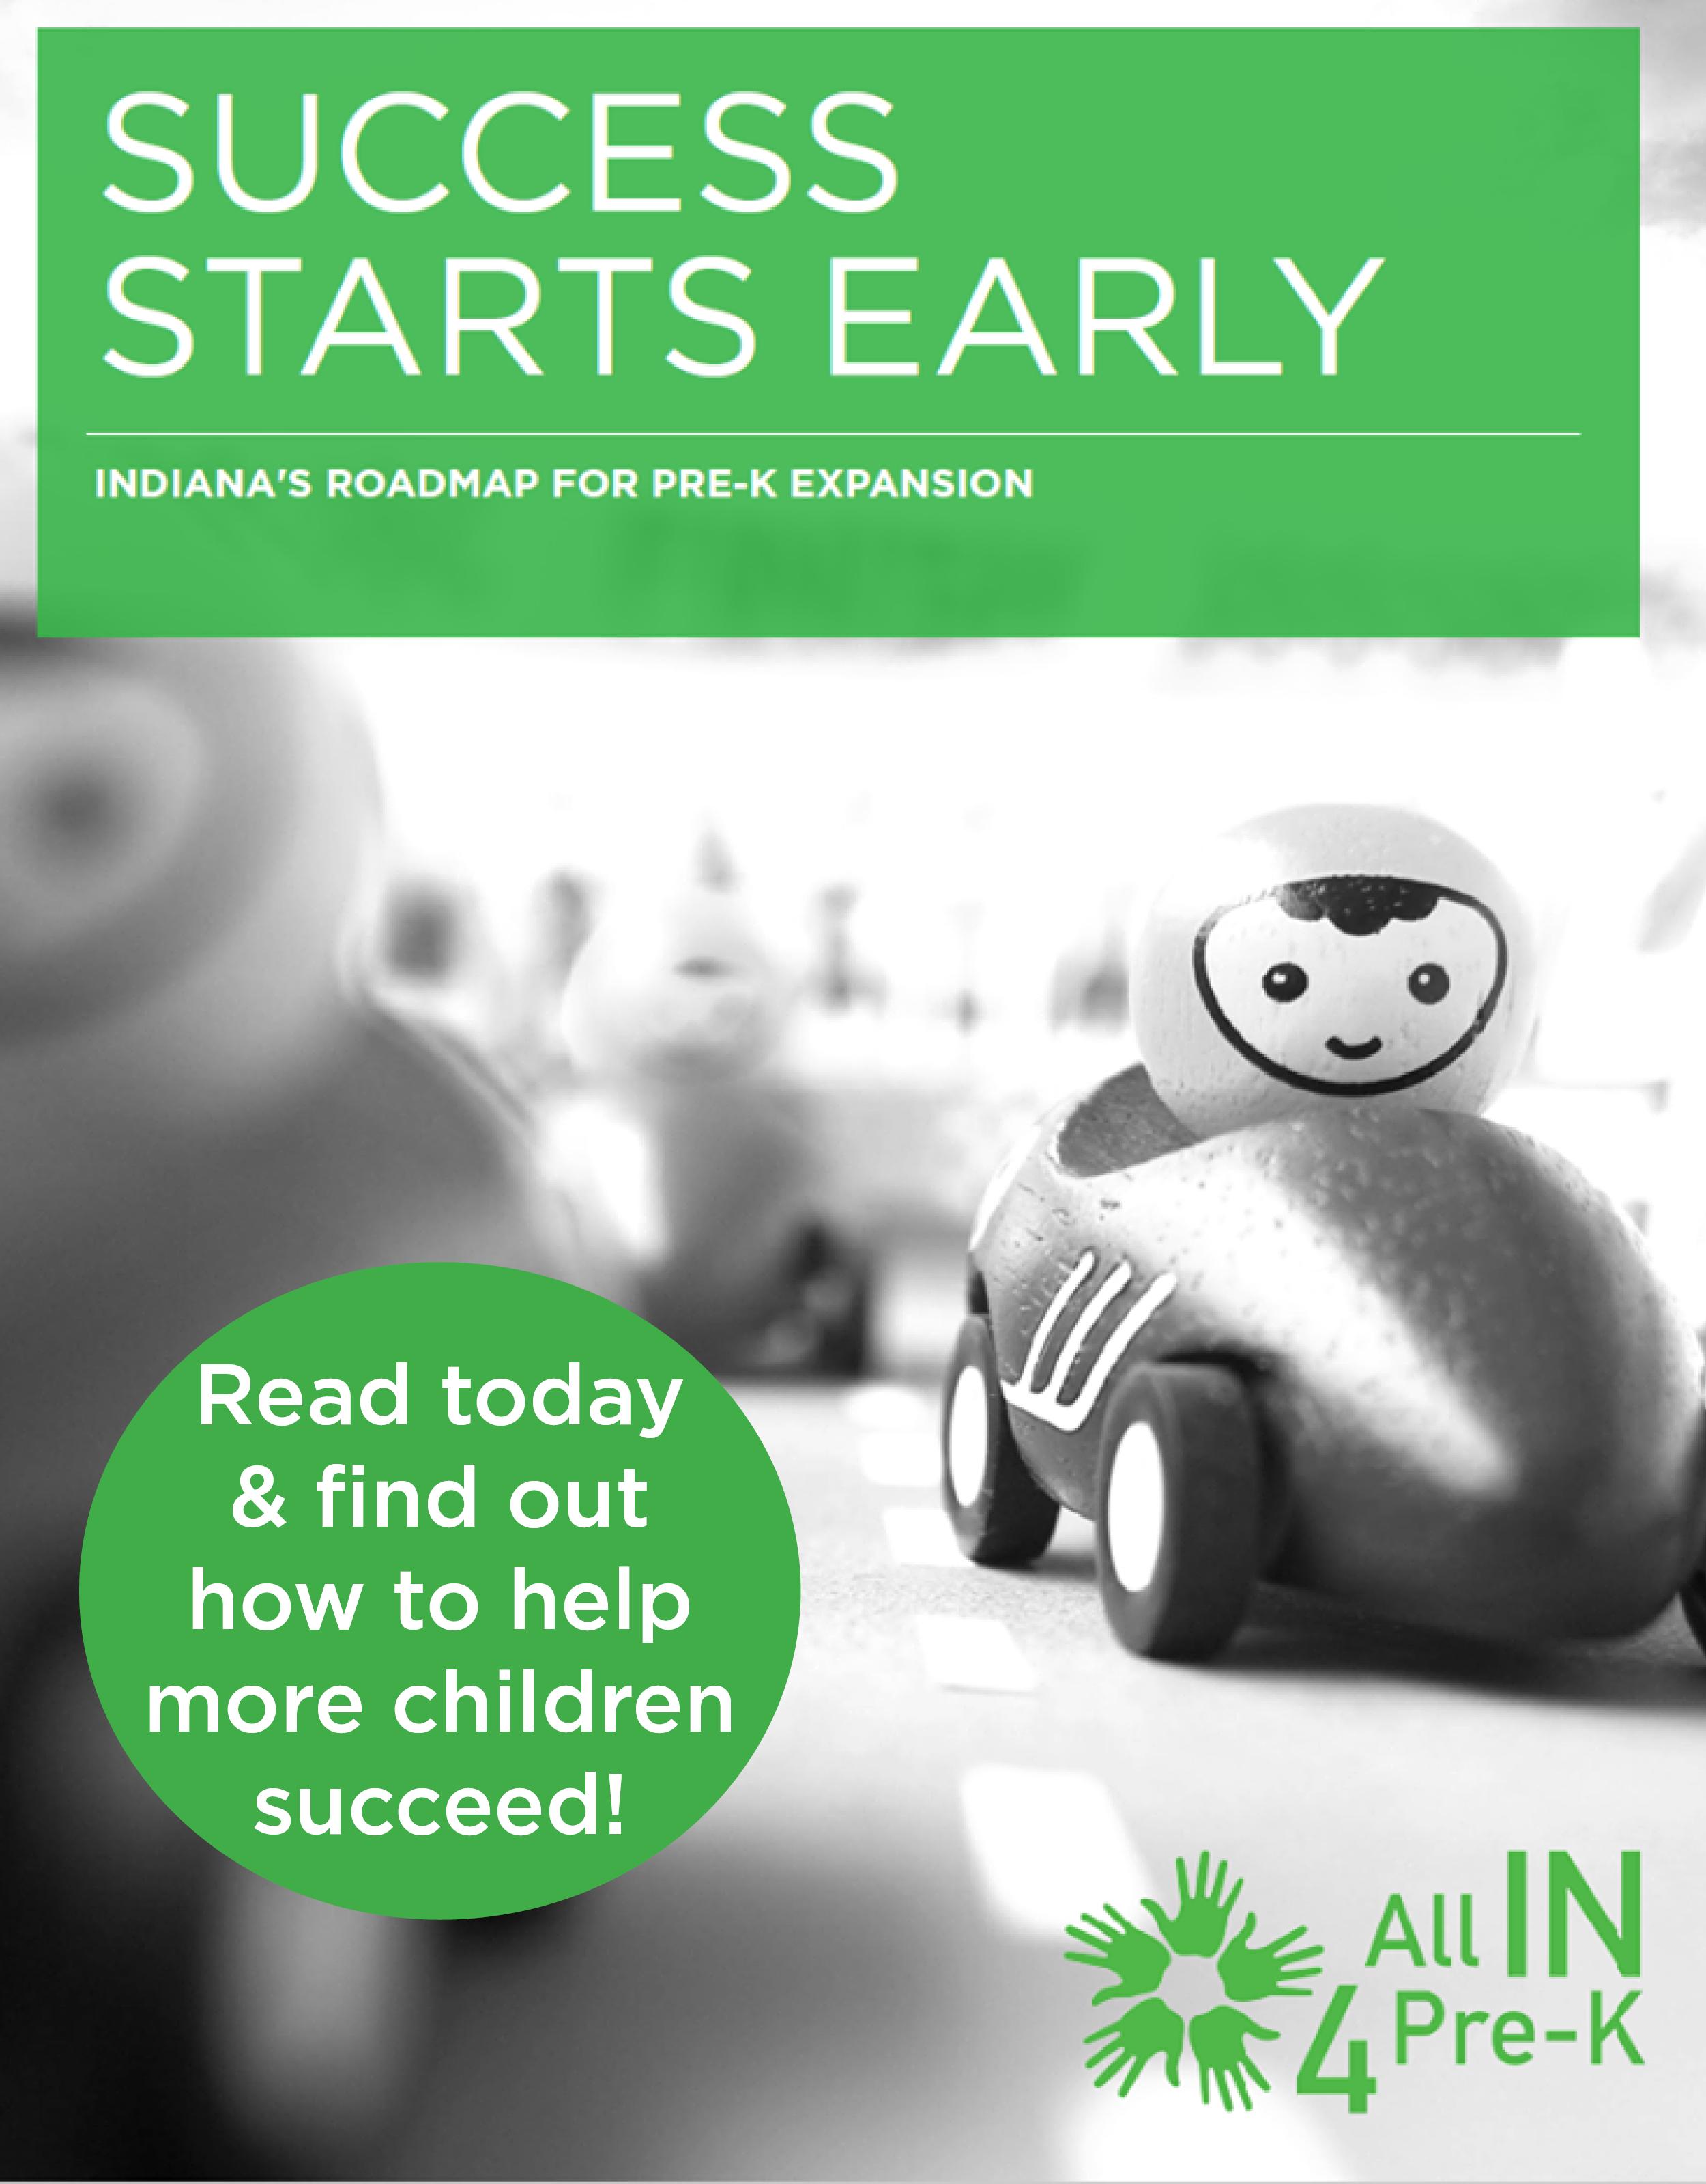 Read_Indiana_PreK_Plan_Roadmap_Success_Starts_Early.png